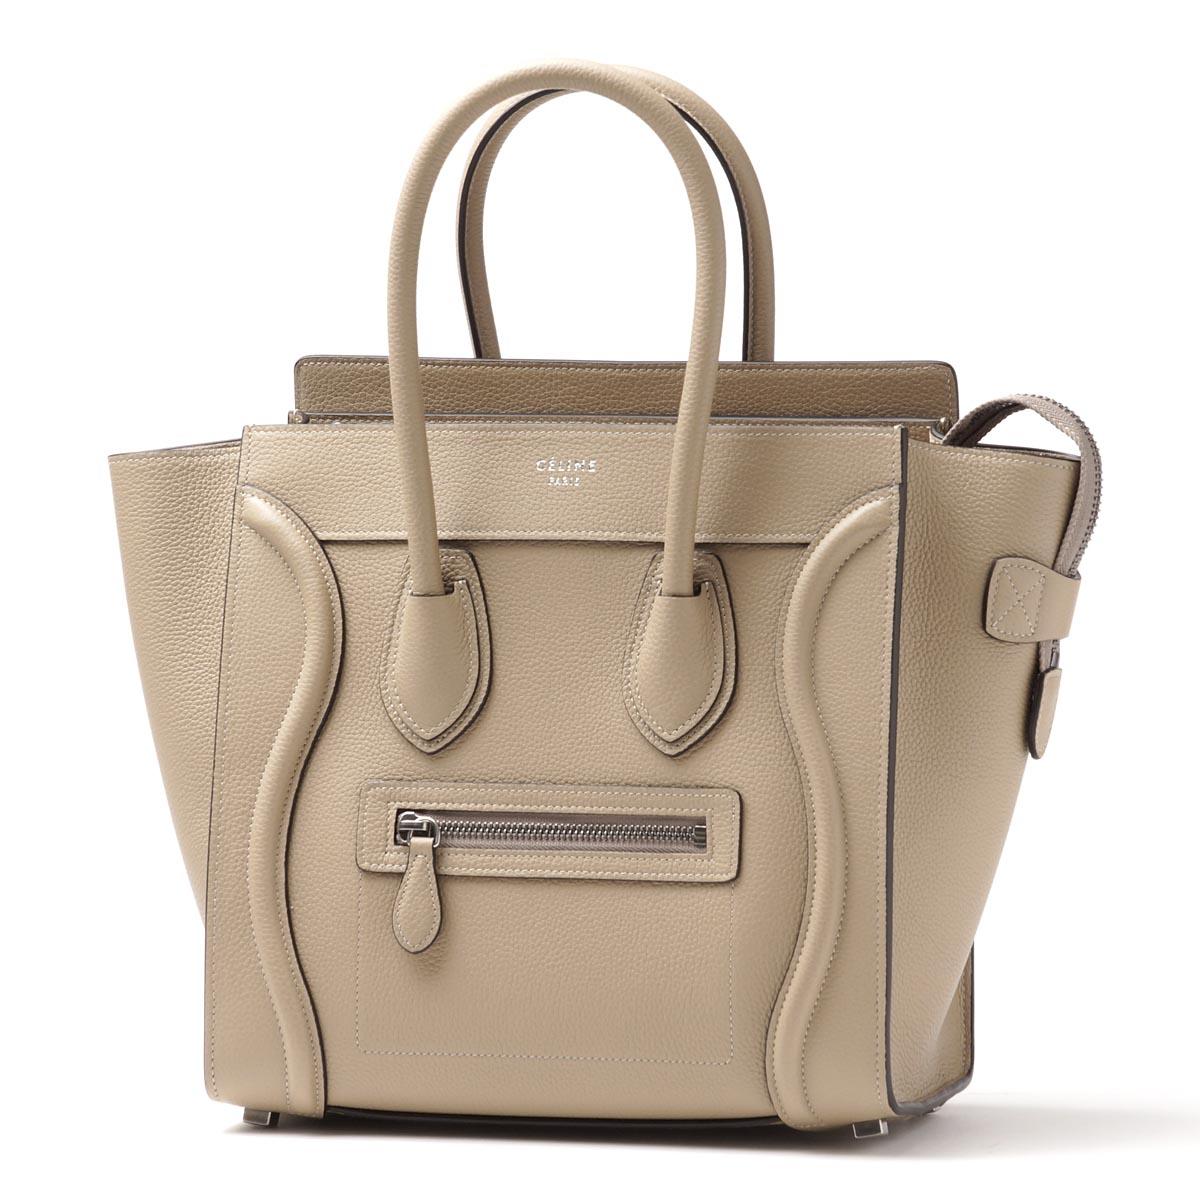 celine handbags online - Modern Blue Rakuten Ichiba Shop | Rakuten Global Market: Celine ...